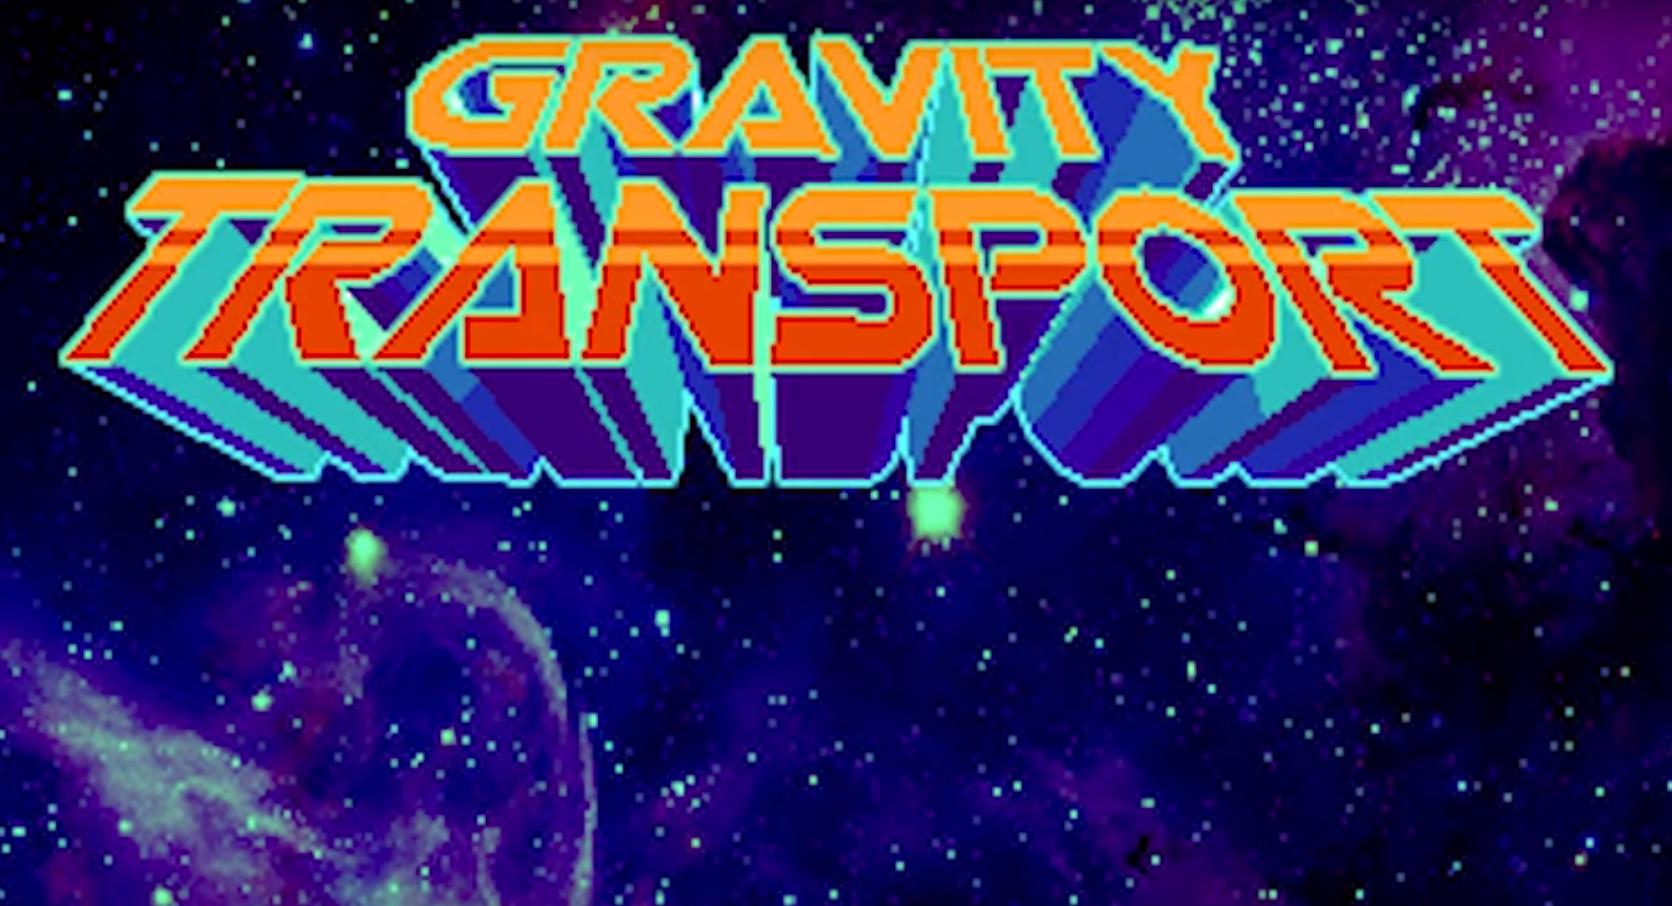 Gravity Transport